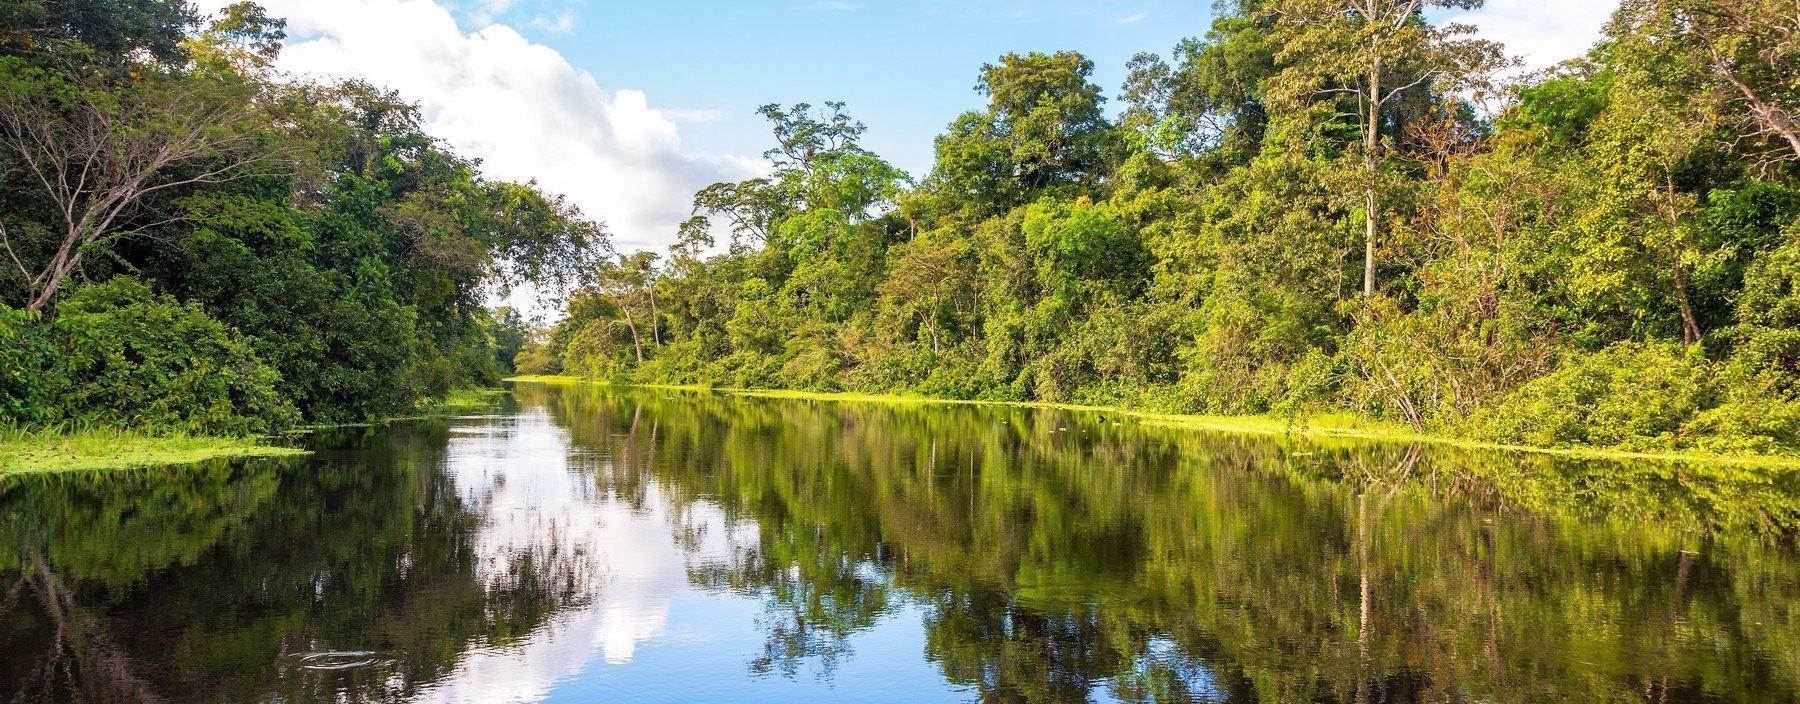 pe, iquitos, amazone regenwoud (2).jpg